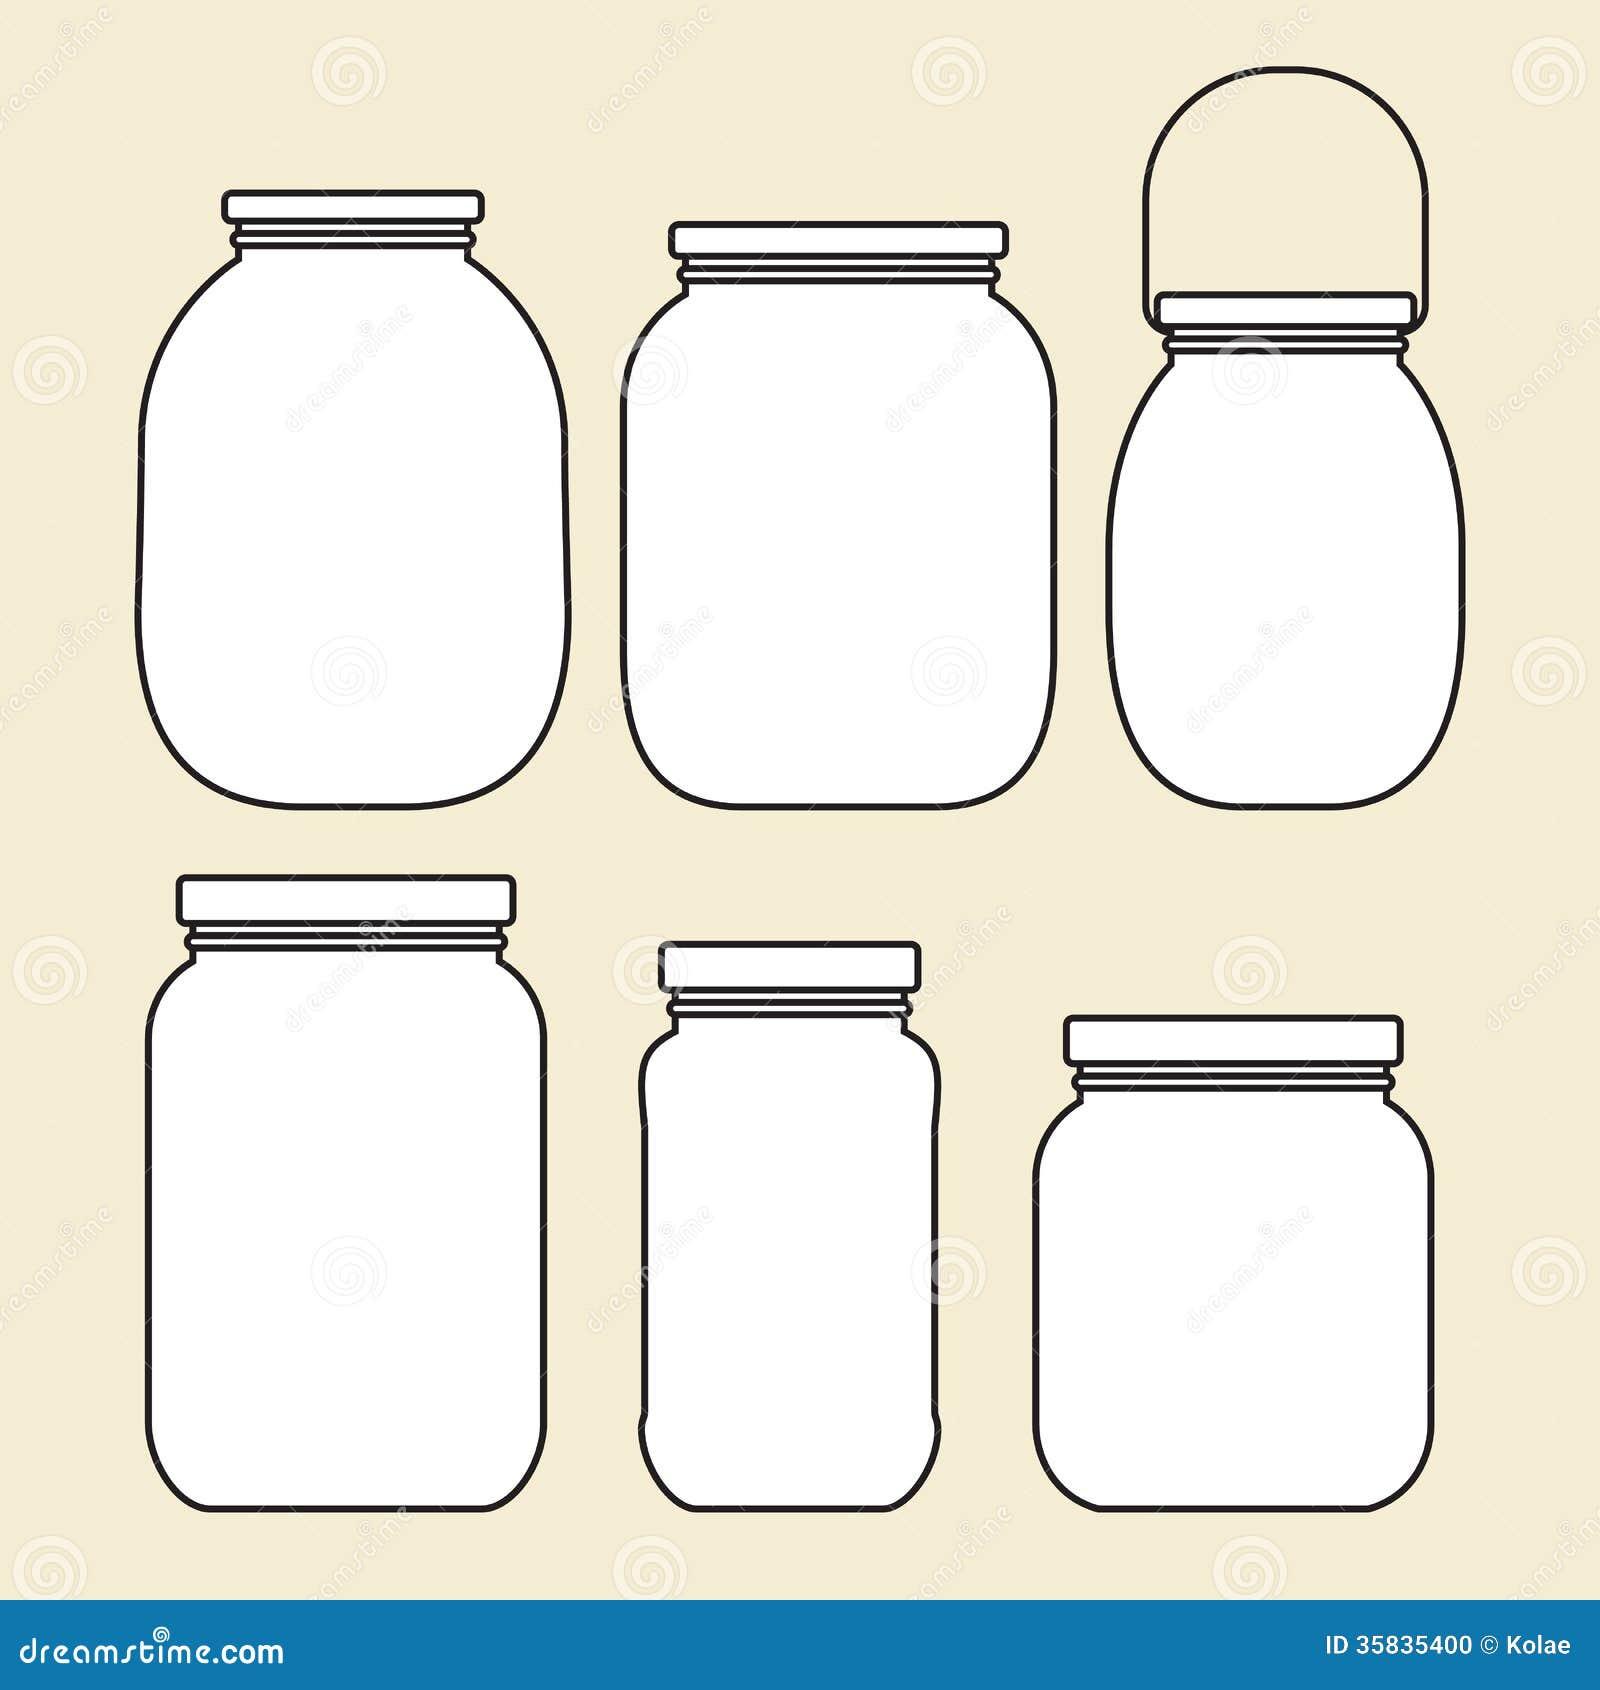 Set Of Jars Template Stock Photo - Image: 35835400